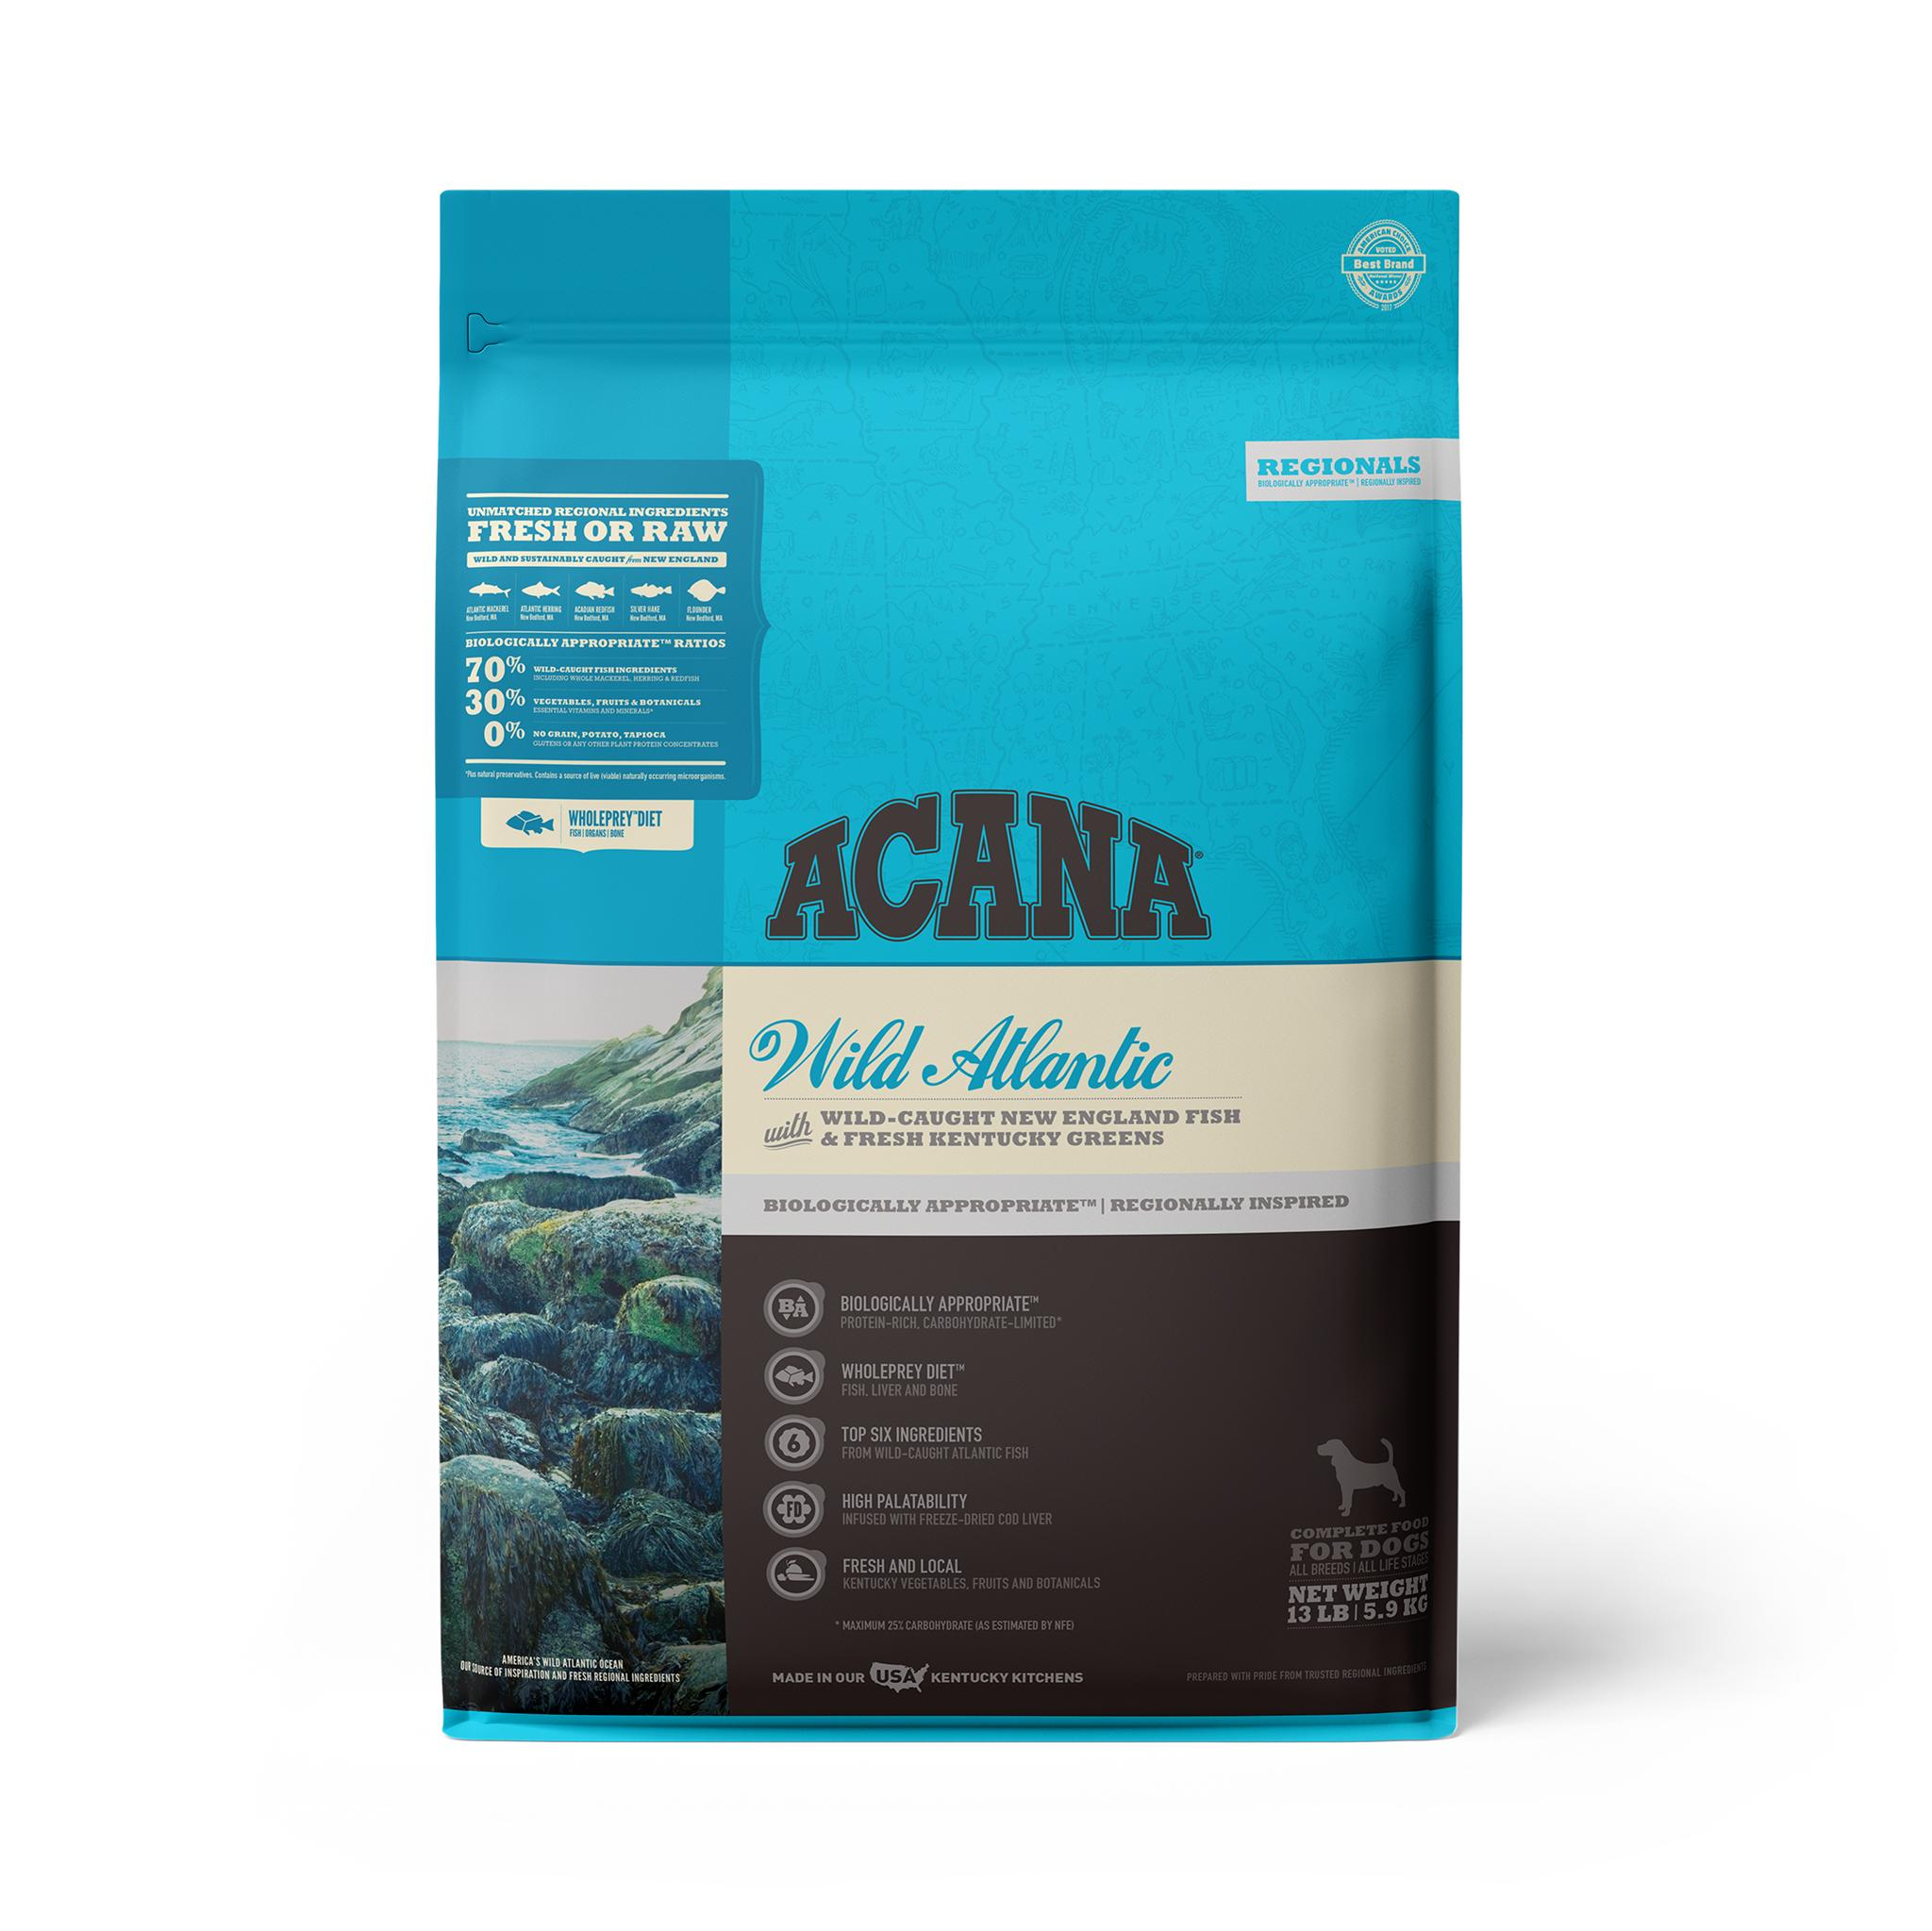 ACANA Regionals Wild Atlantic Grain-Free Dry Dog Food, 13-lb